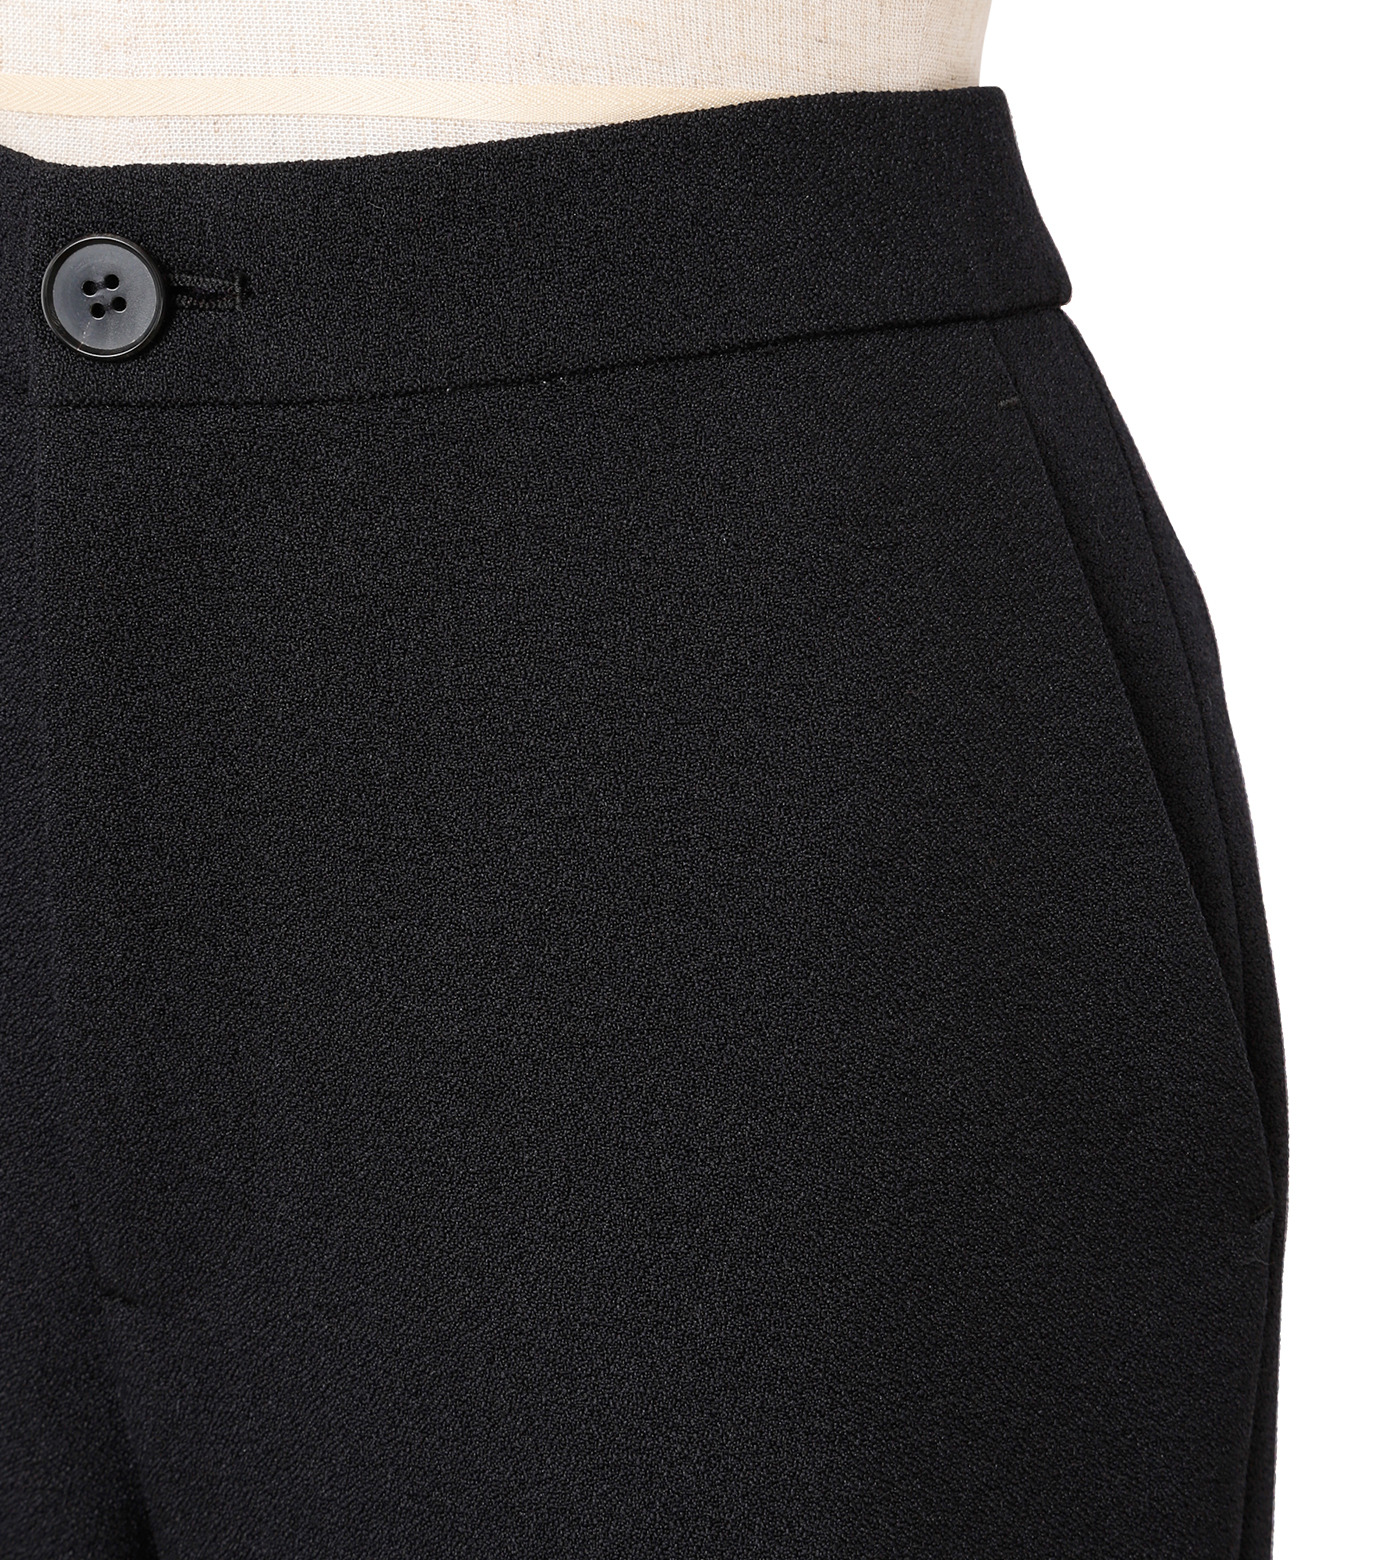 IRENE(アイレネ)のトランペットトラウザー-BLACK(パンツ/pants)-18A88002 拡大詳細画像4